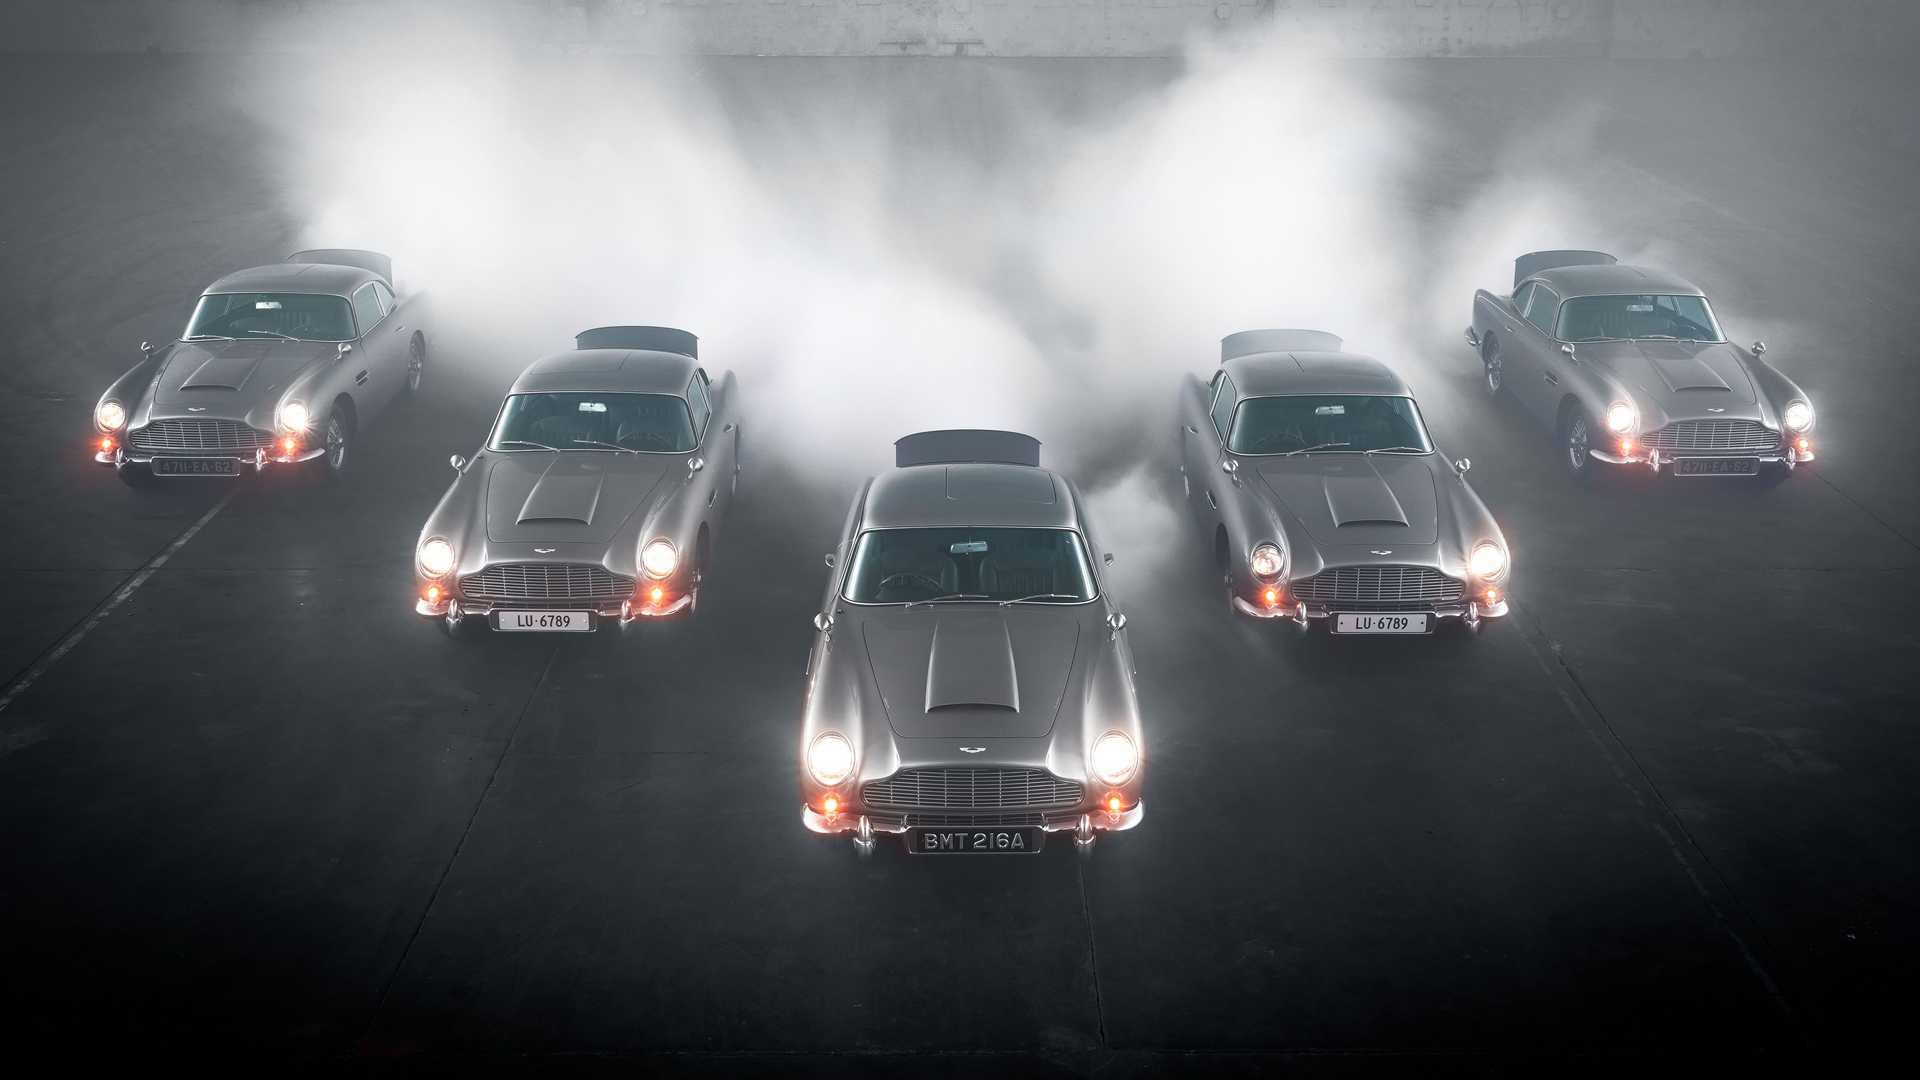 Започнаа испораките на Aston Martin DB5 Goldfinger Continuation